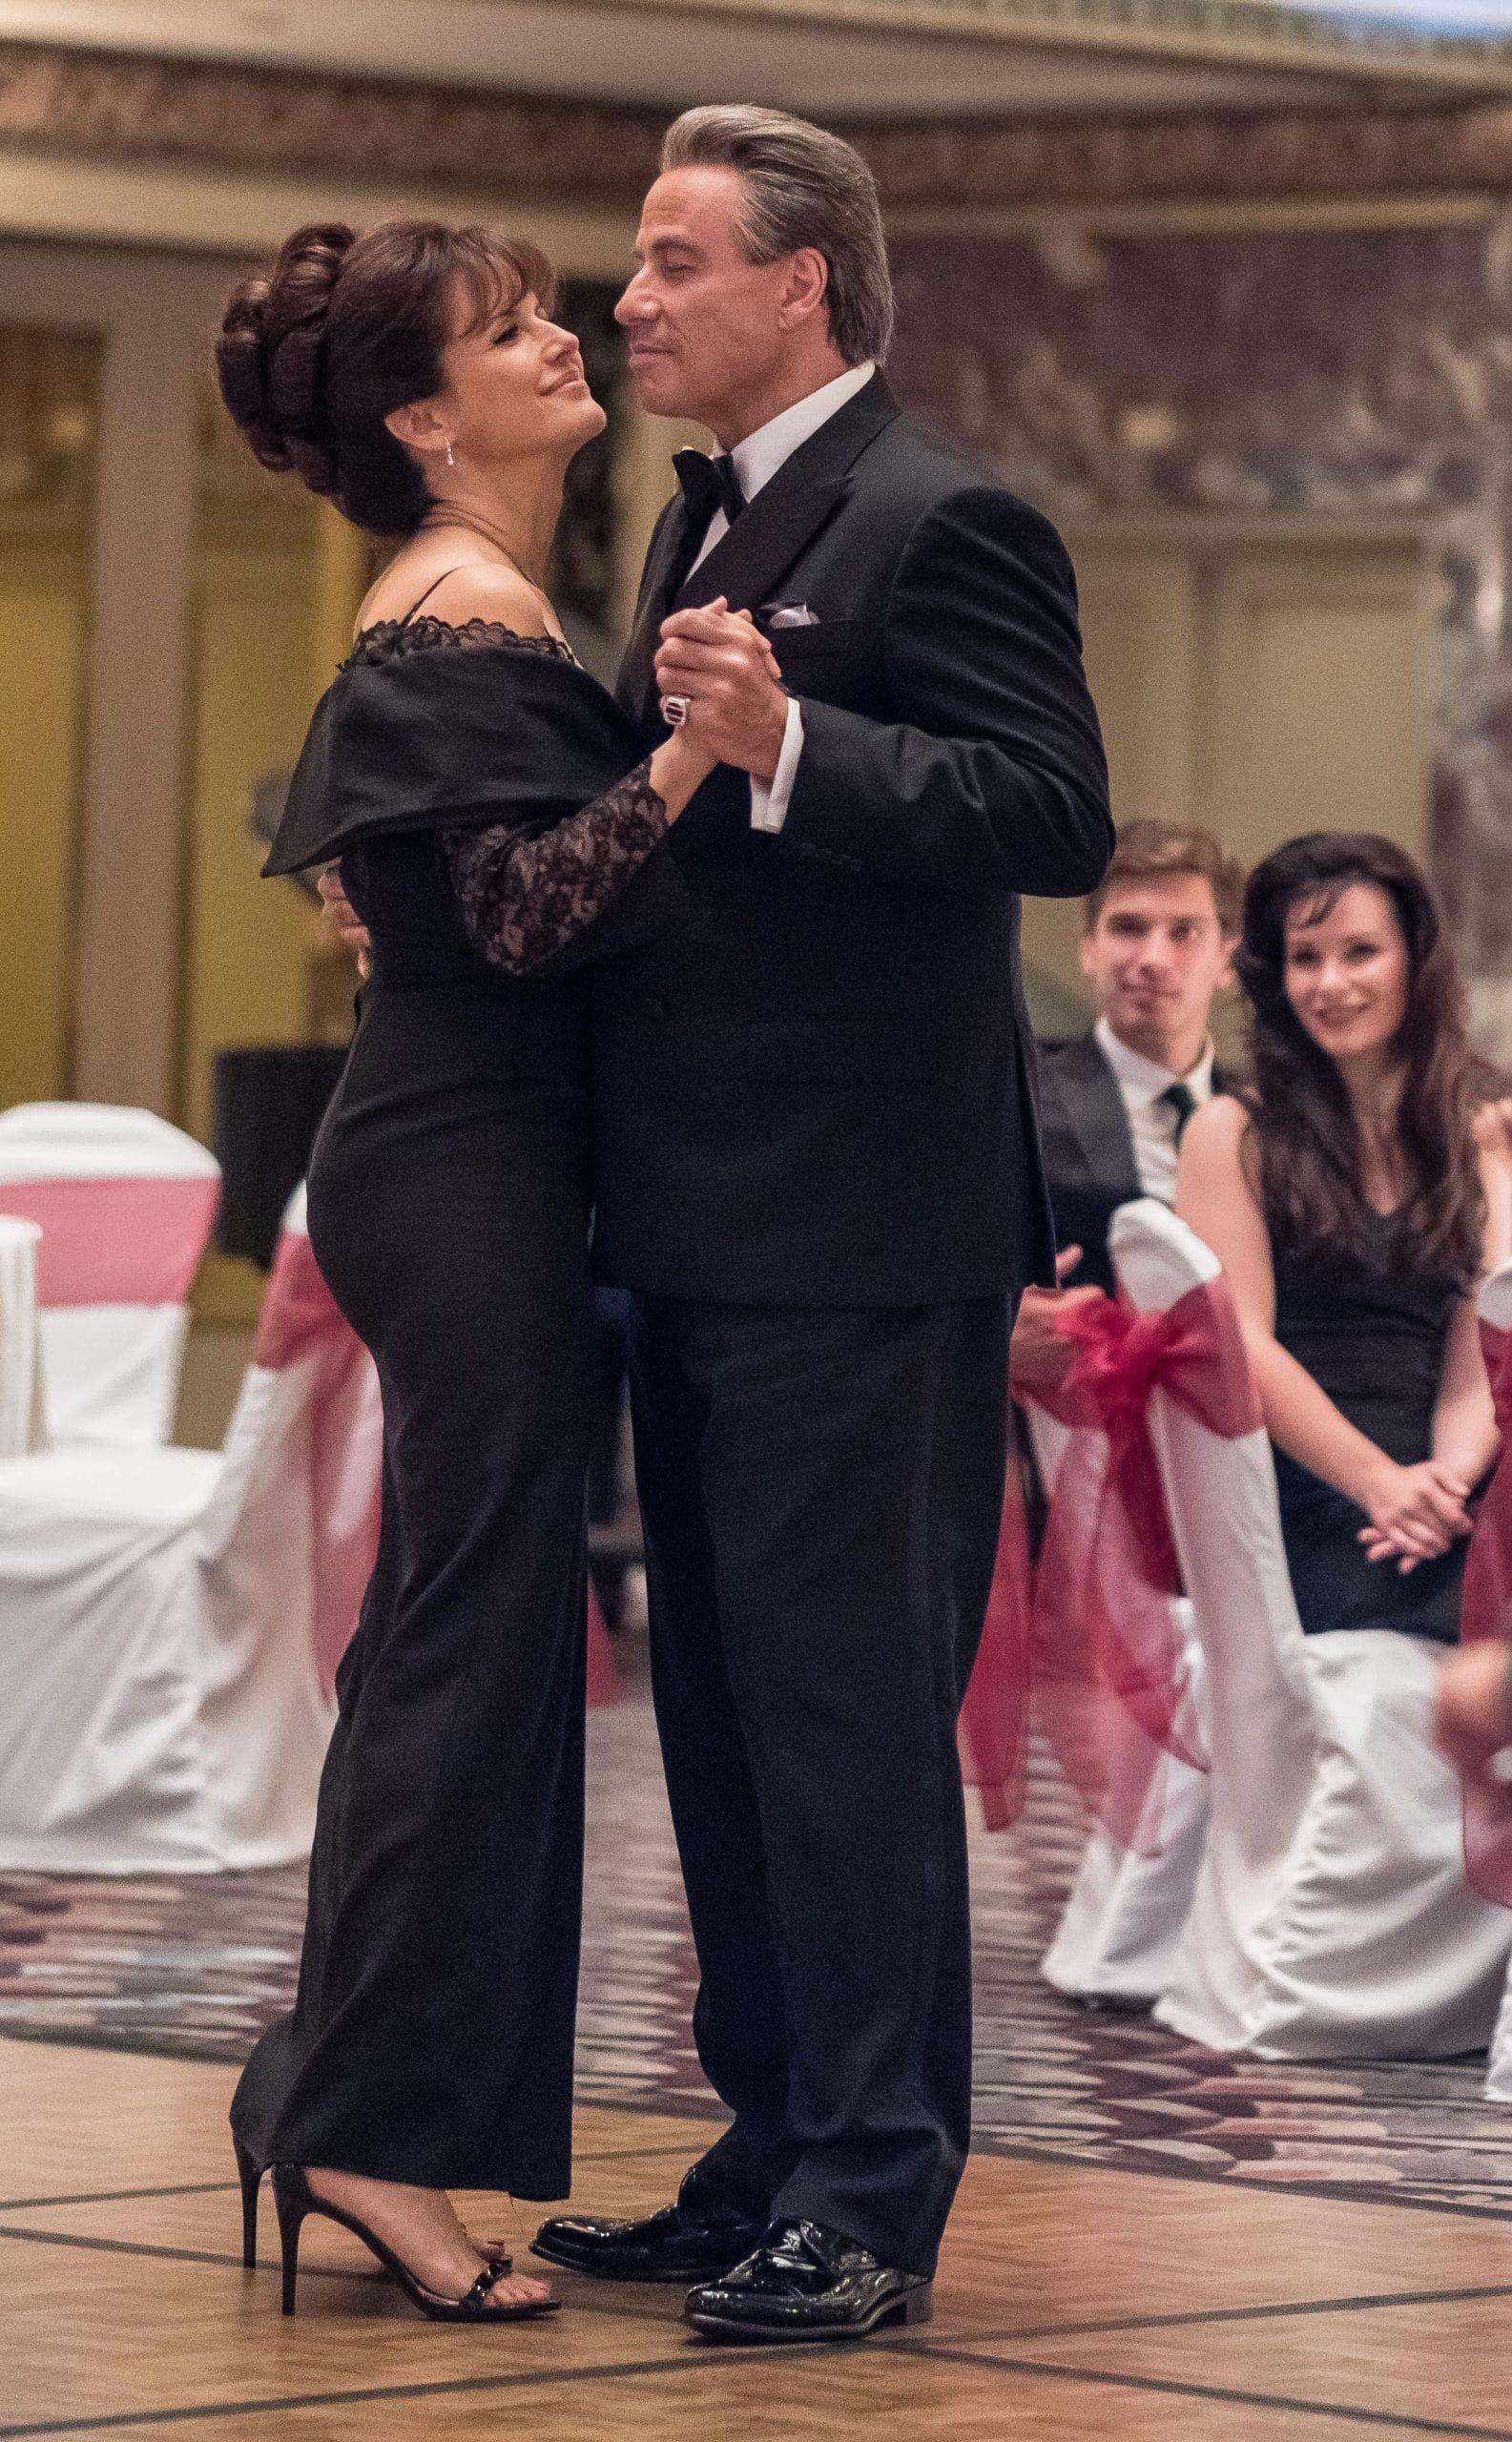 GOTTI, from left: Kelly Preston, John Travolta, as John Gotti Sr.